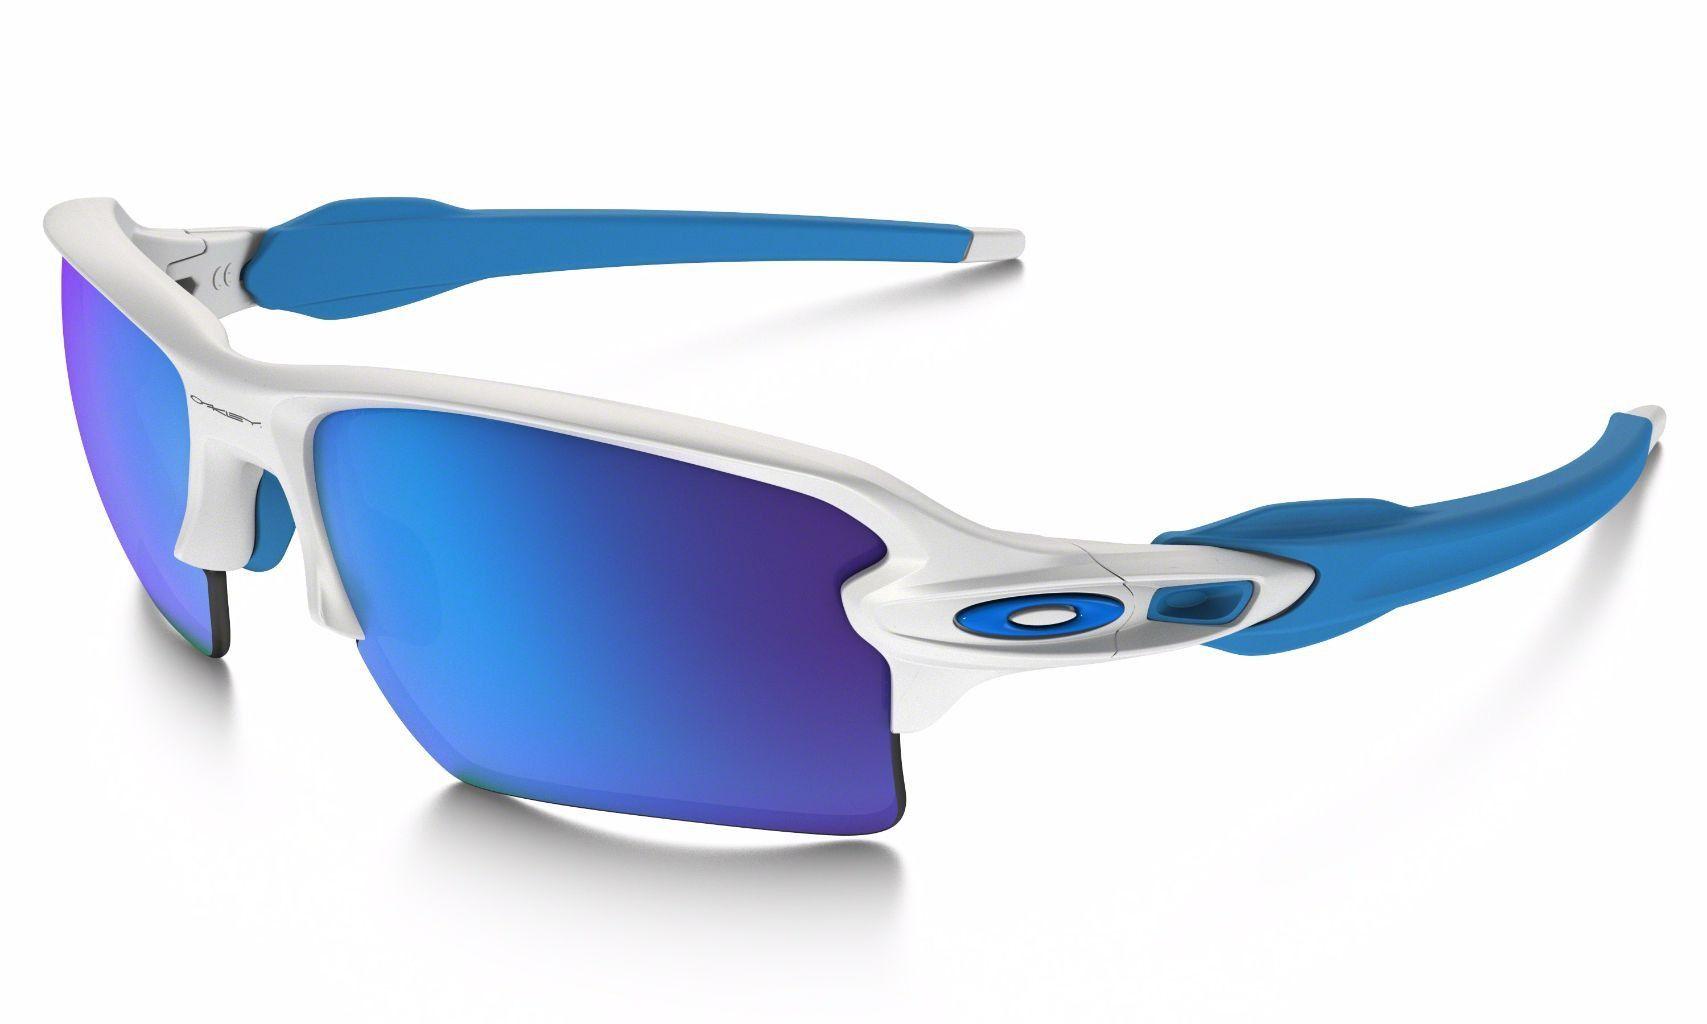 92e0173cf999a Oakley Flak 2.0 XL Sunglasses